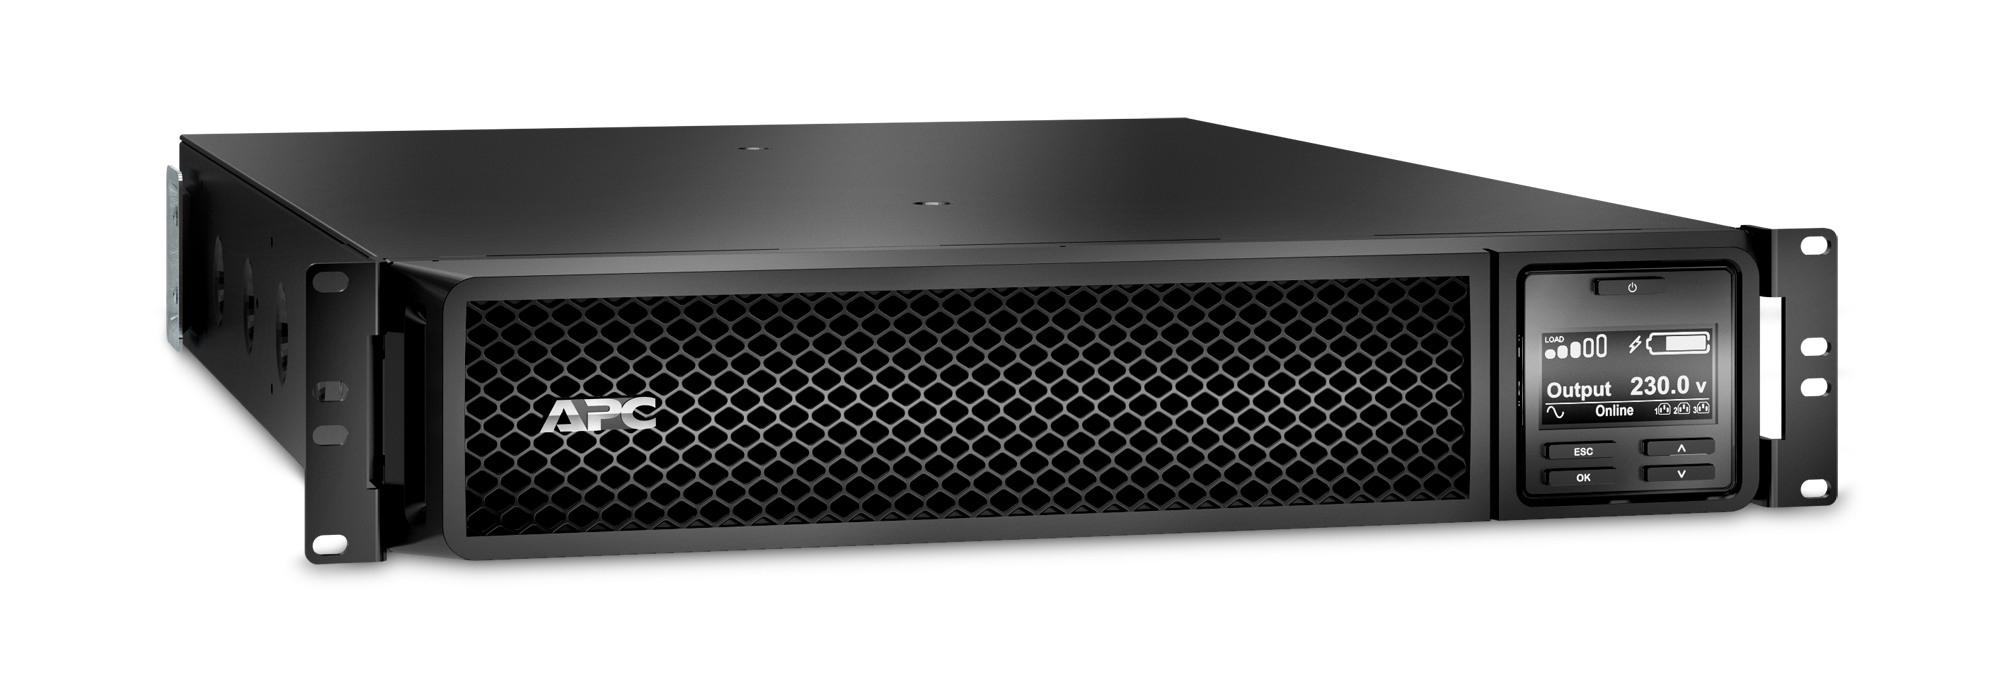 APC Smart-UPS On-Line SRT Doble conversión (en línea) 3000 VA 2700 W